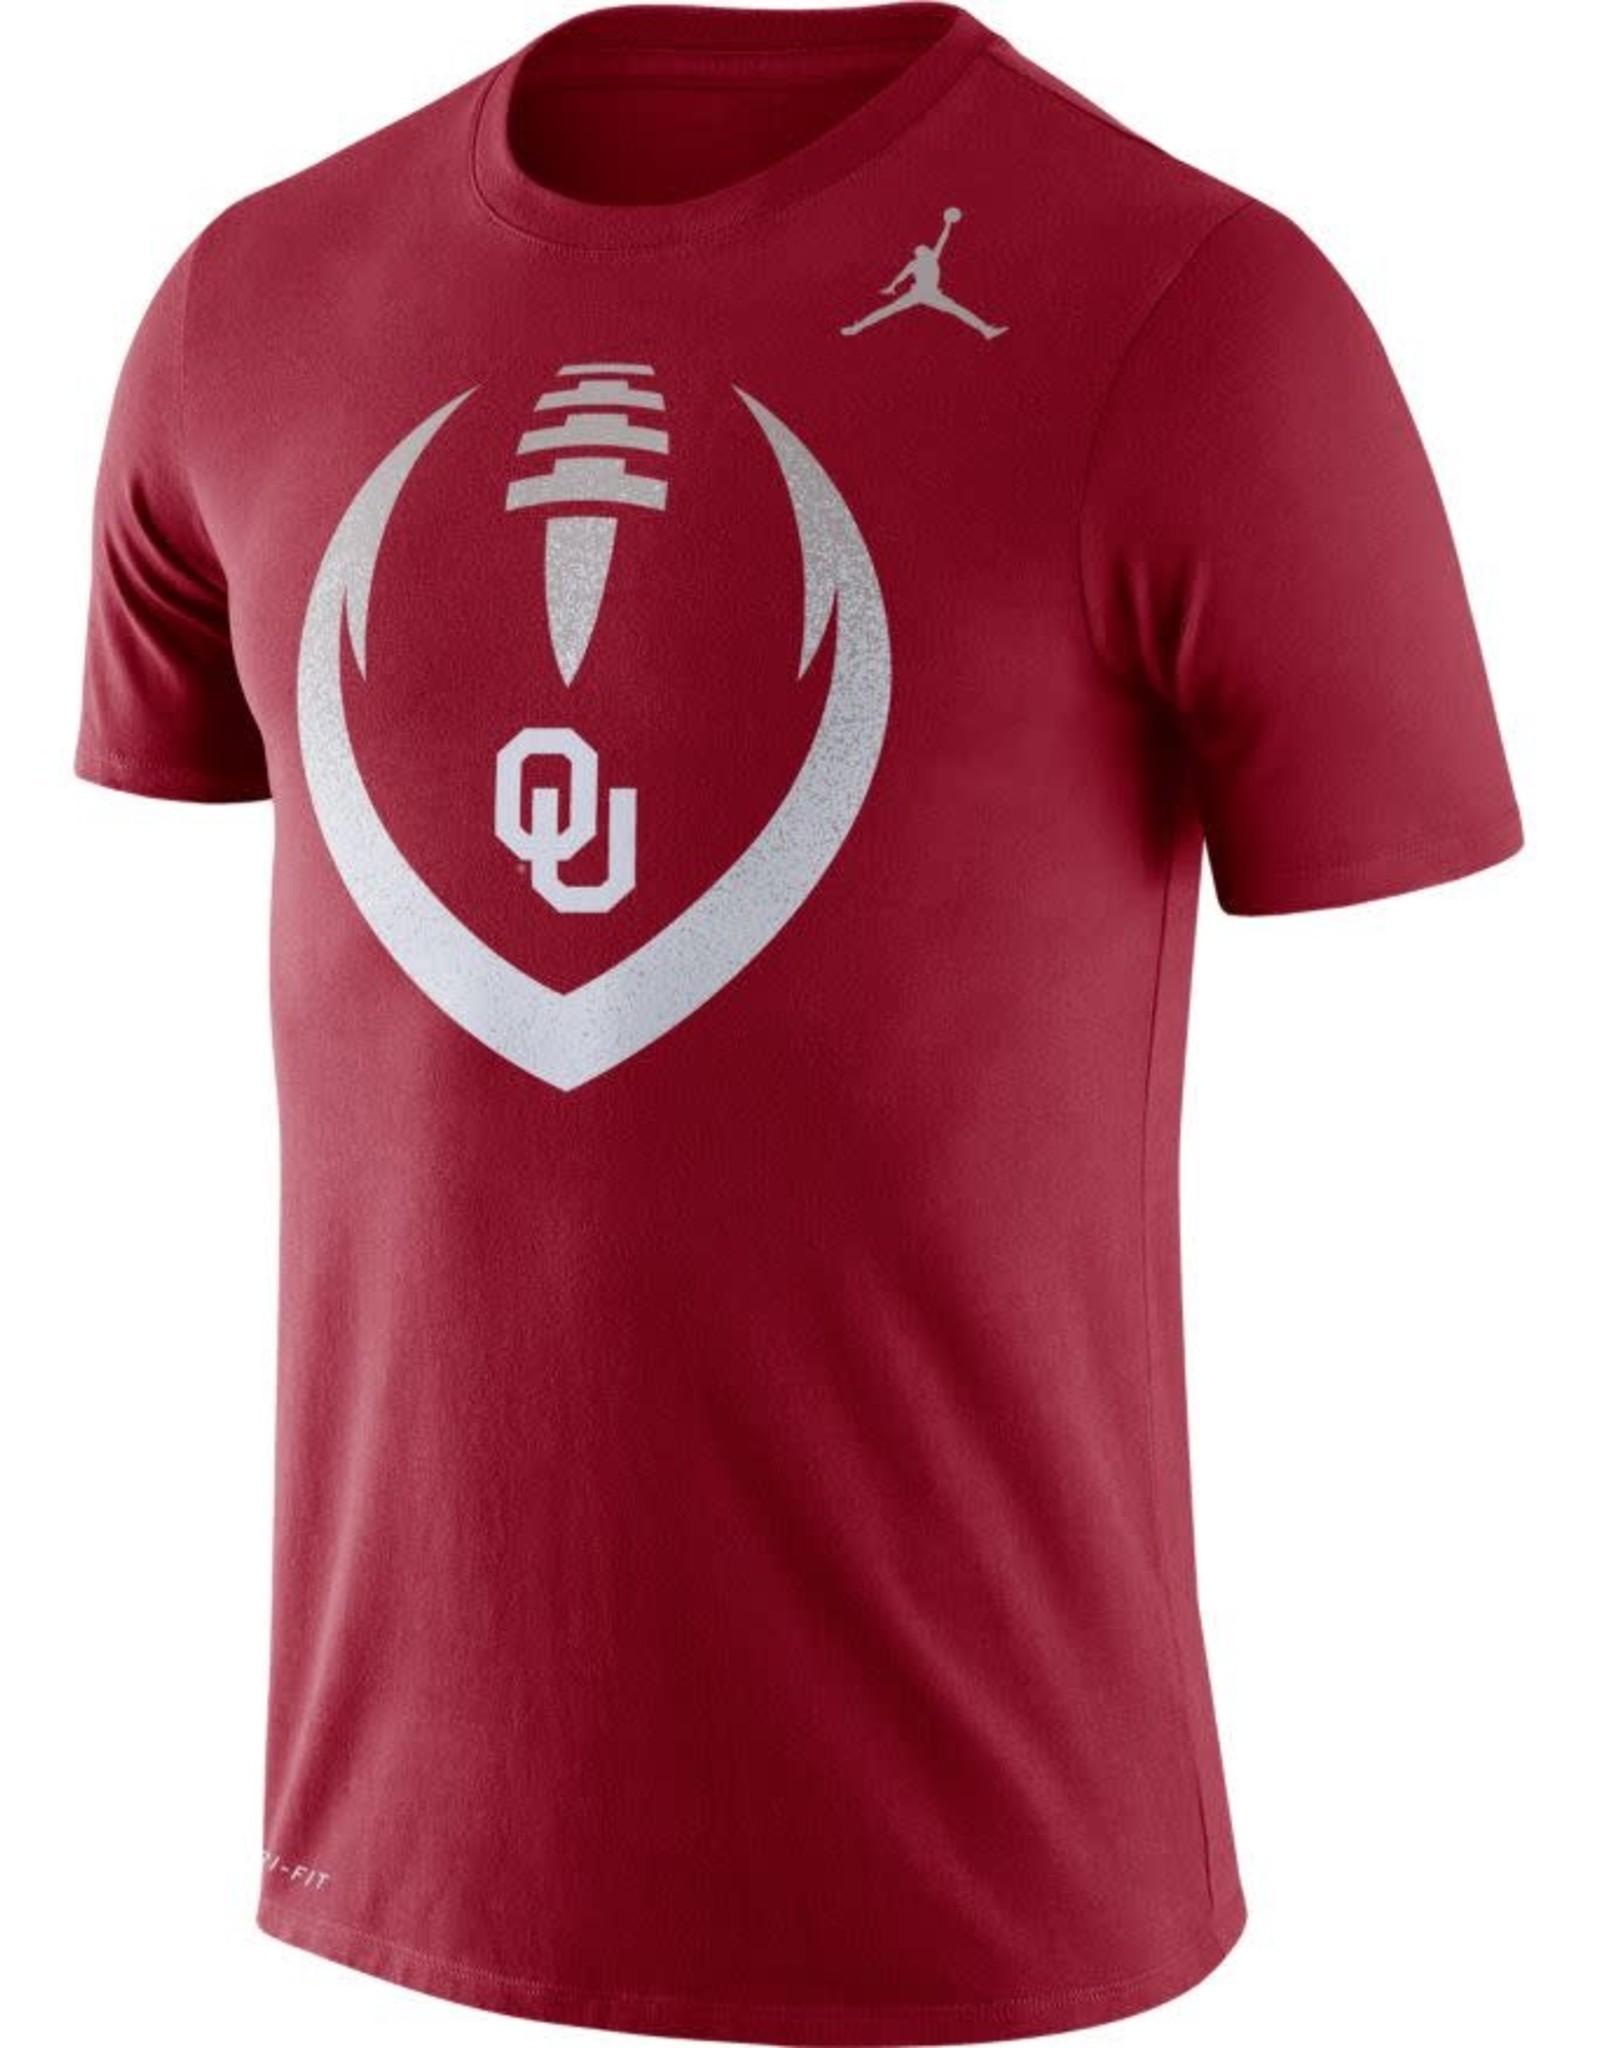 Jordan Men's Jordan Crimson DriFit Cotton OU Football Icon Tee